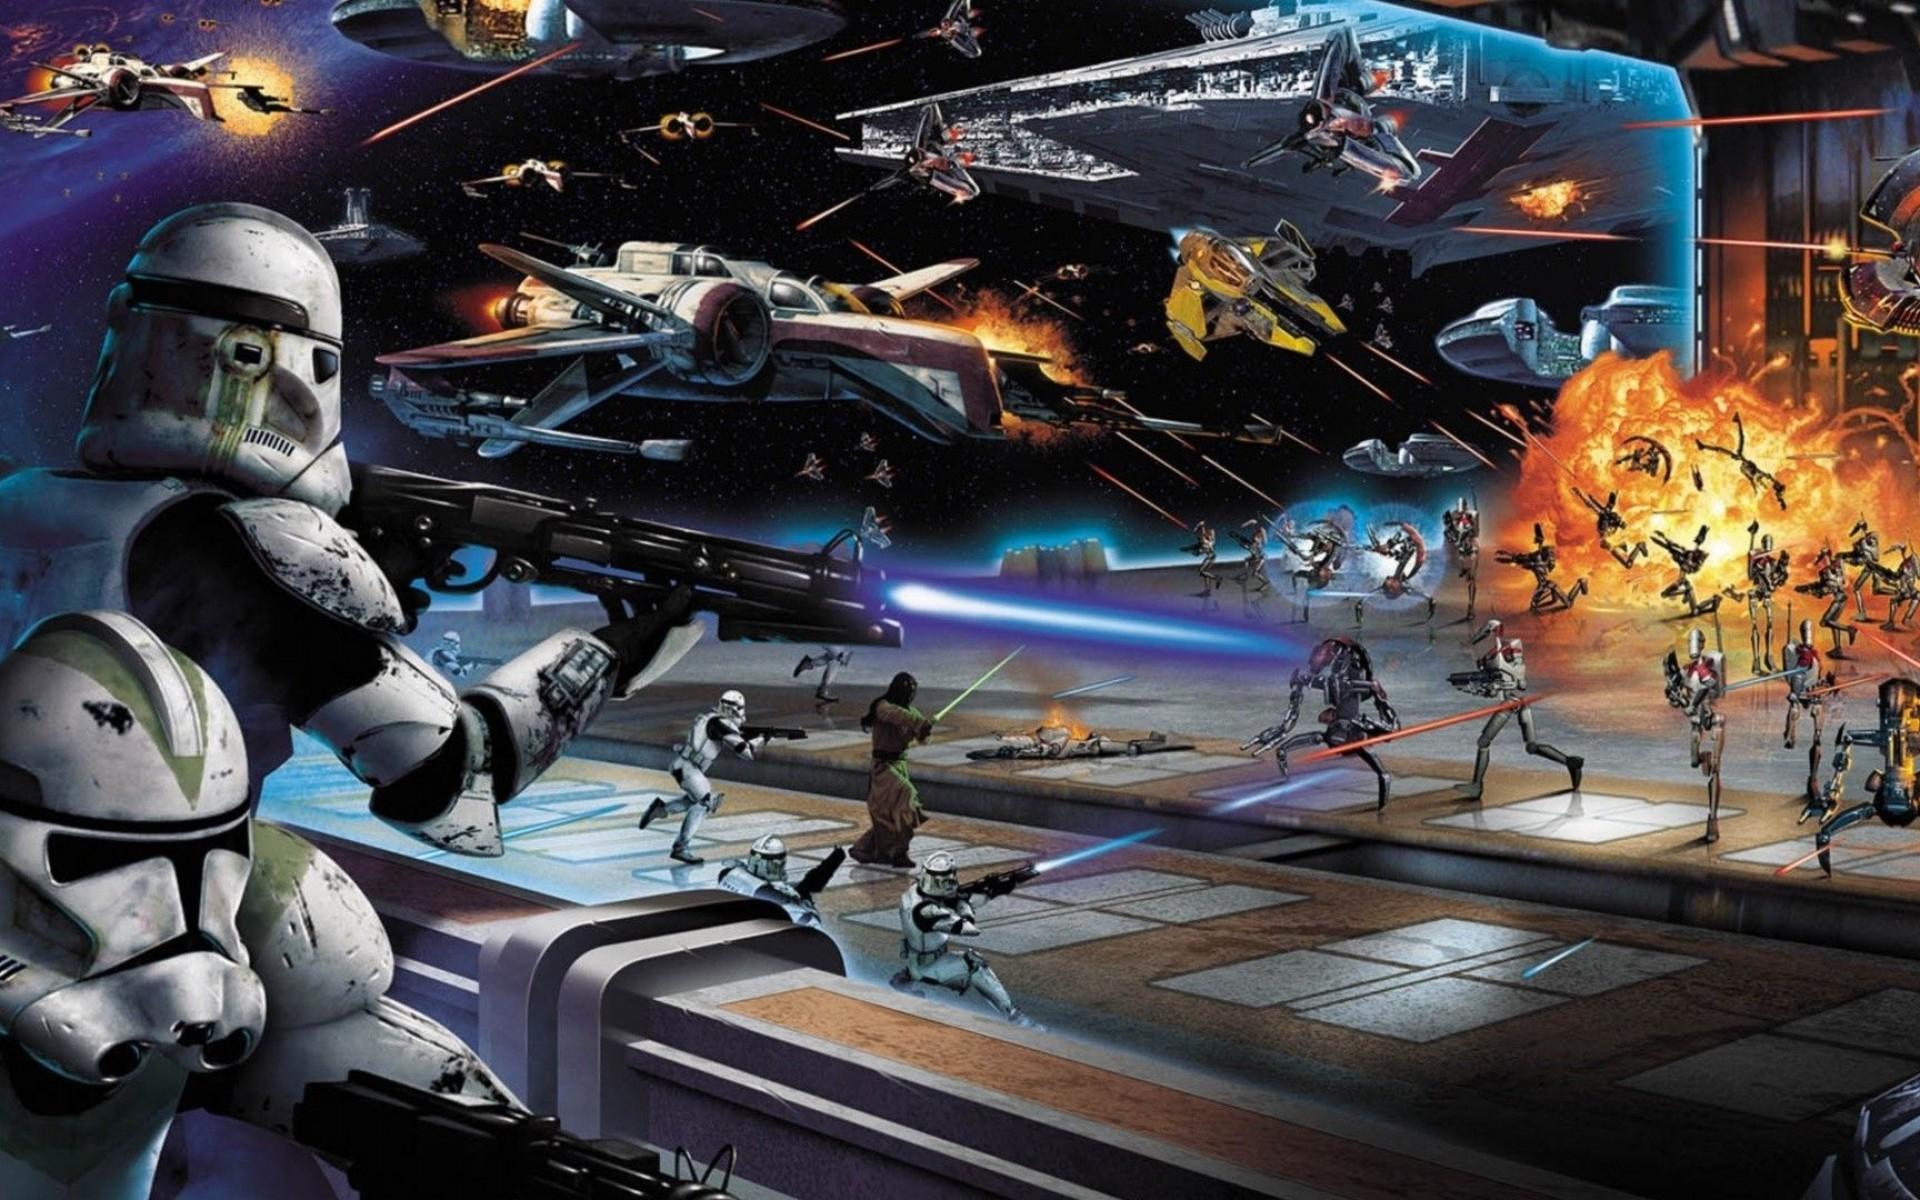 Free Download Star Wars Space Battle Wallpaper 61 Images 1920x1200 For Your Desktop Mobile Tablet Explore 56 Star Wars Clone Wars Space Background Star Wars Clone Wars Space Background